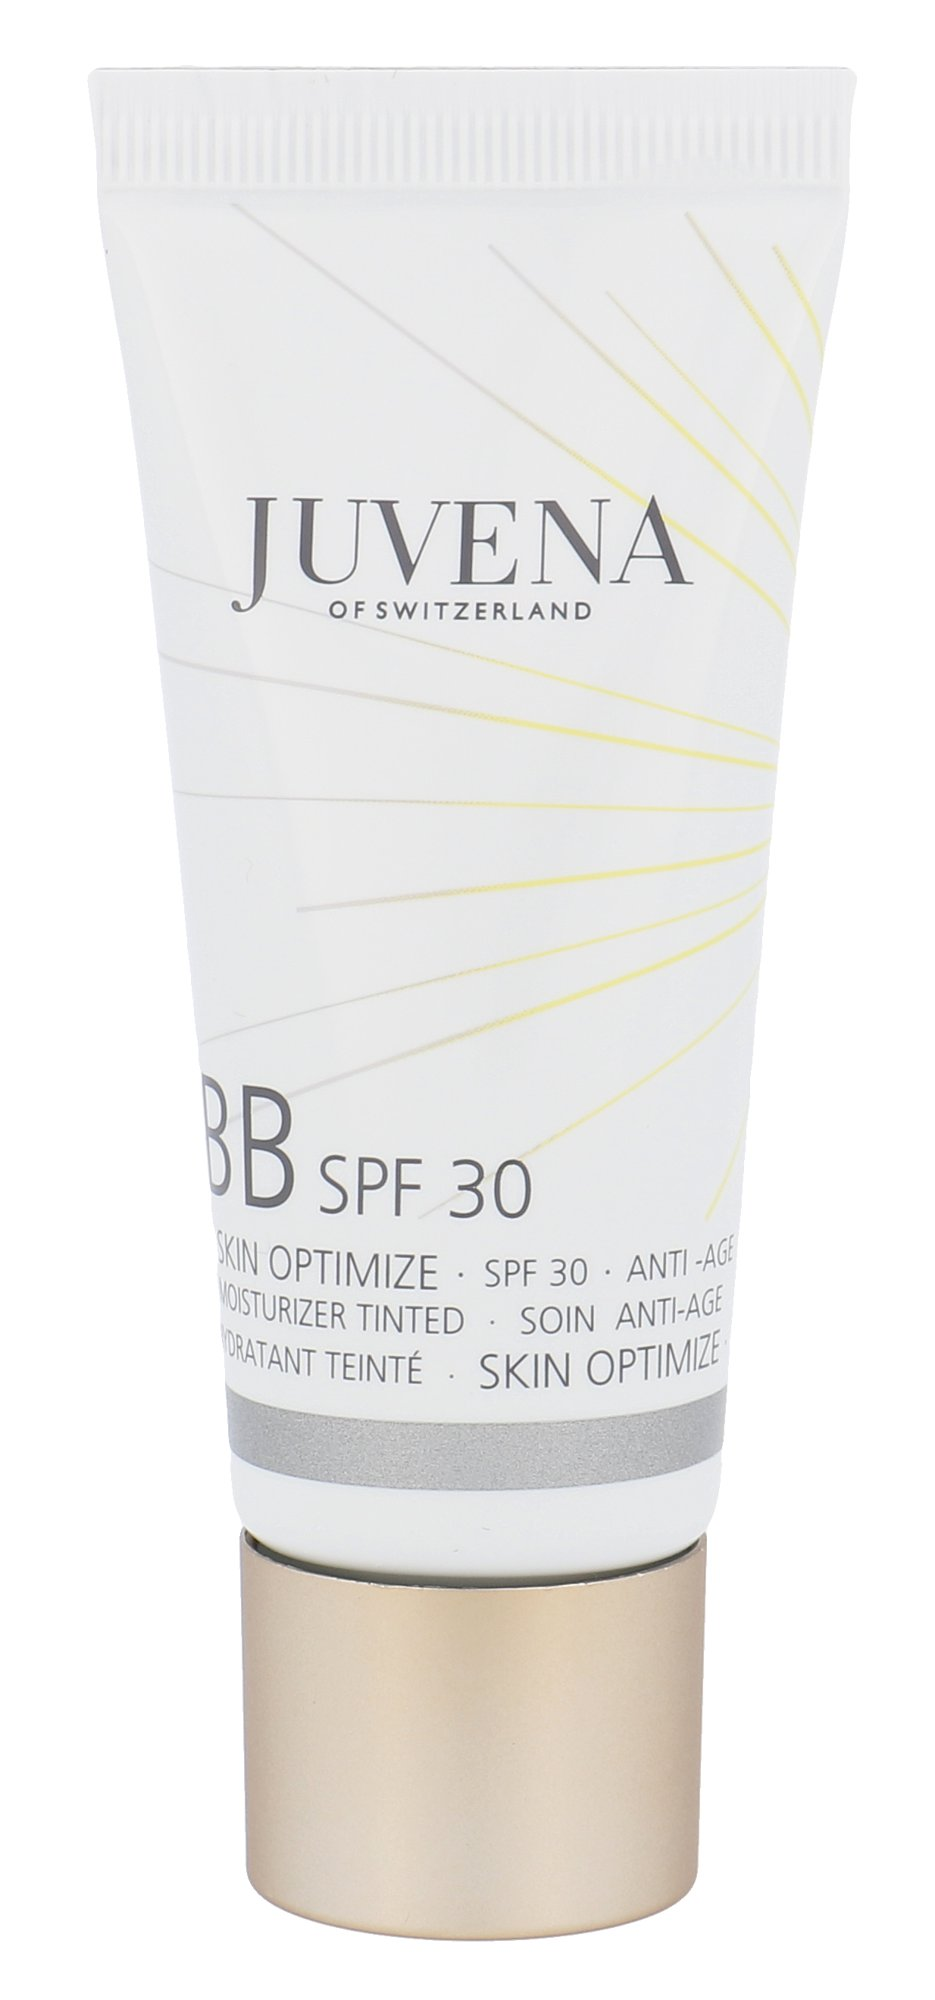 Juvena Skin Prevent & Optimize BB Cream SPF 30 40 ml